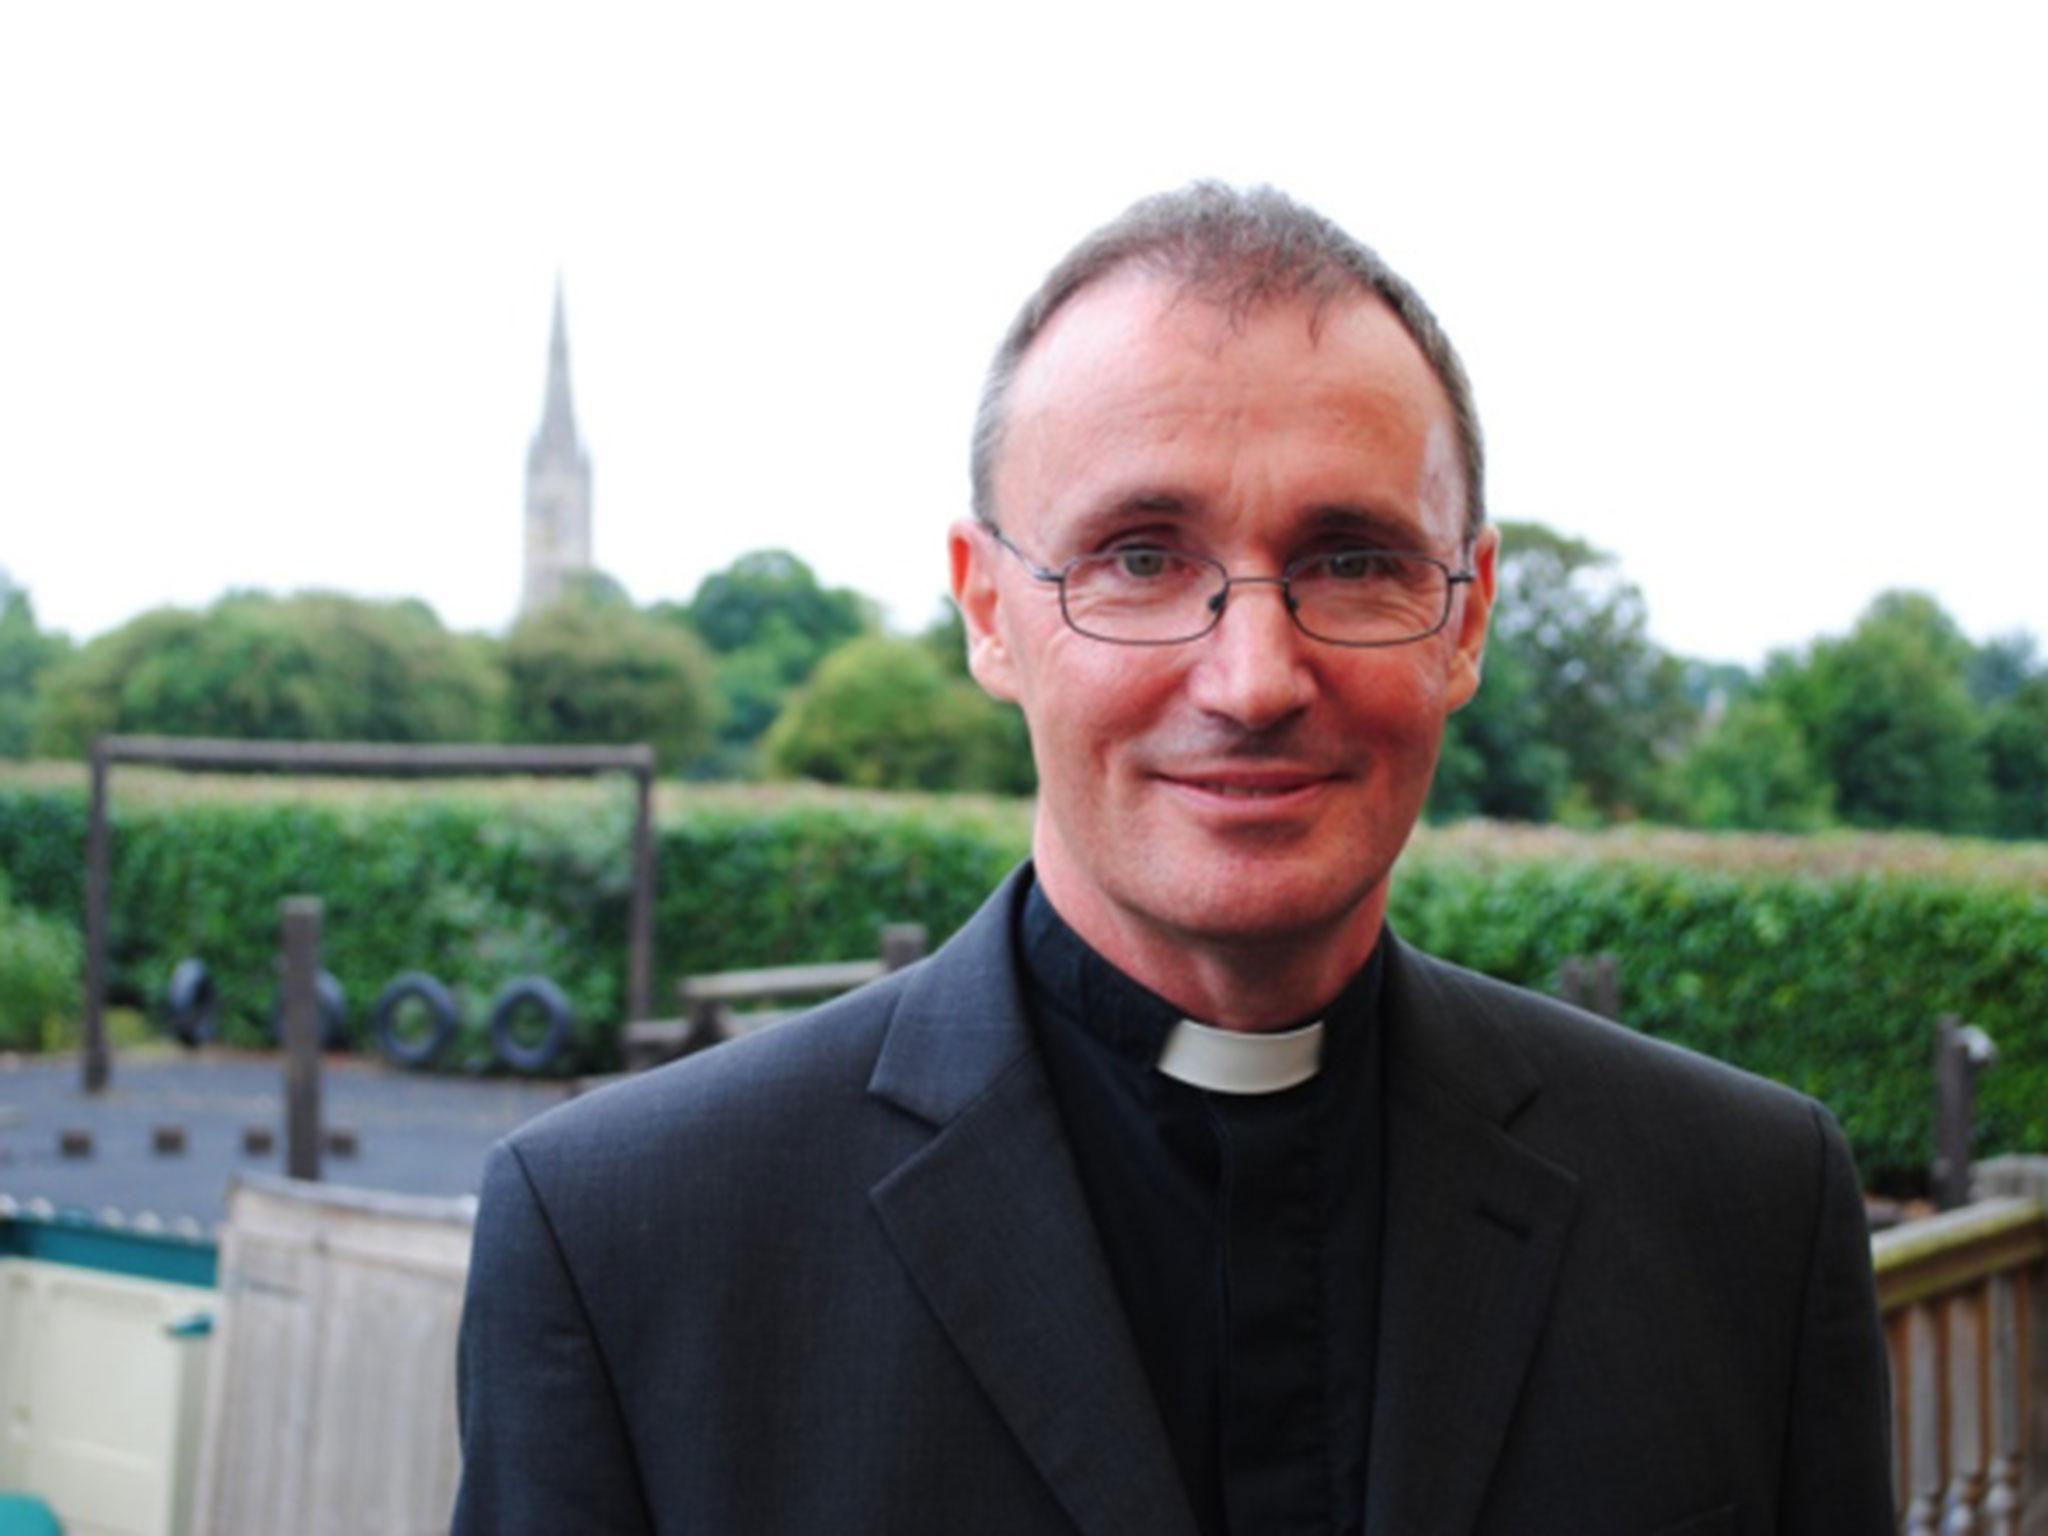 Gay sex on church mission